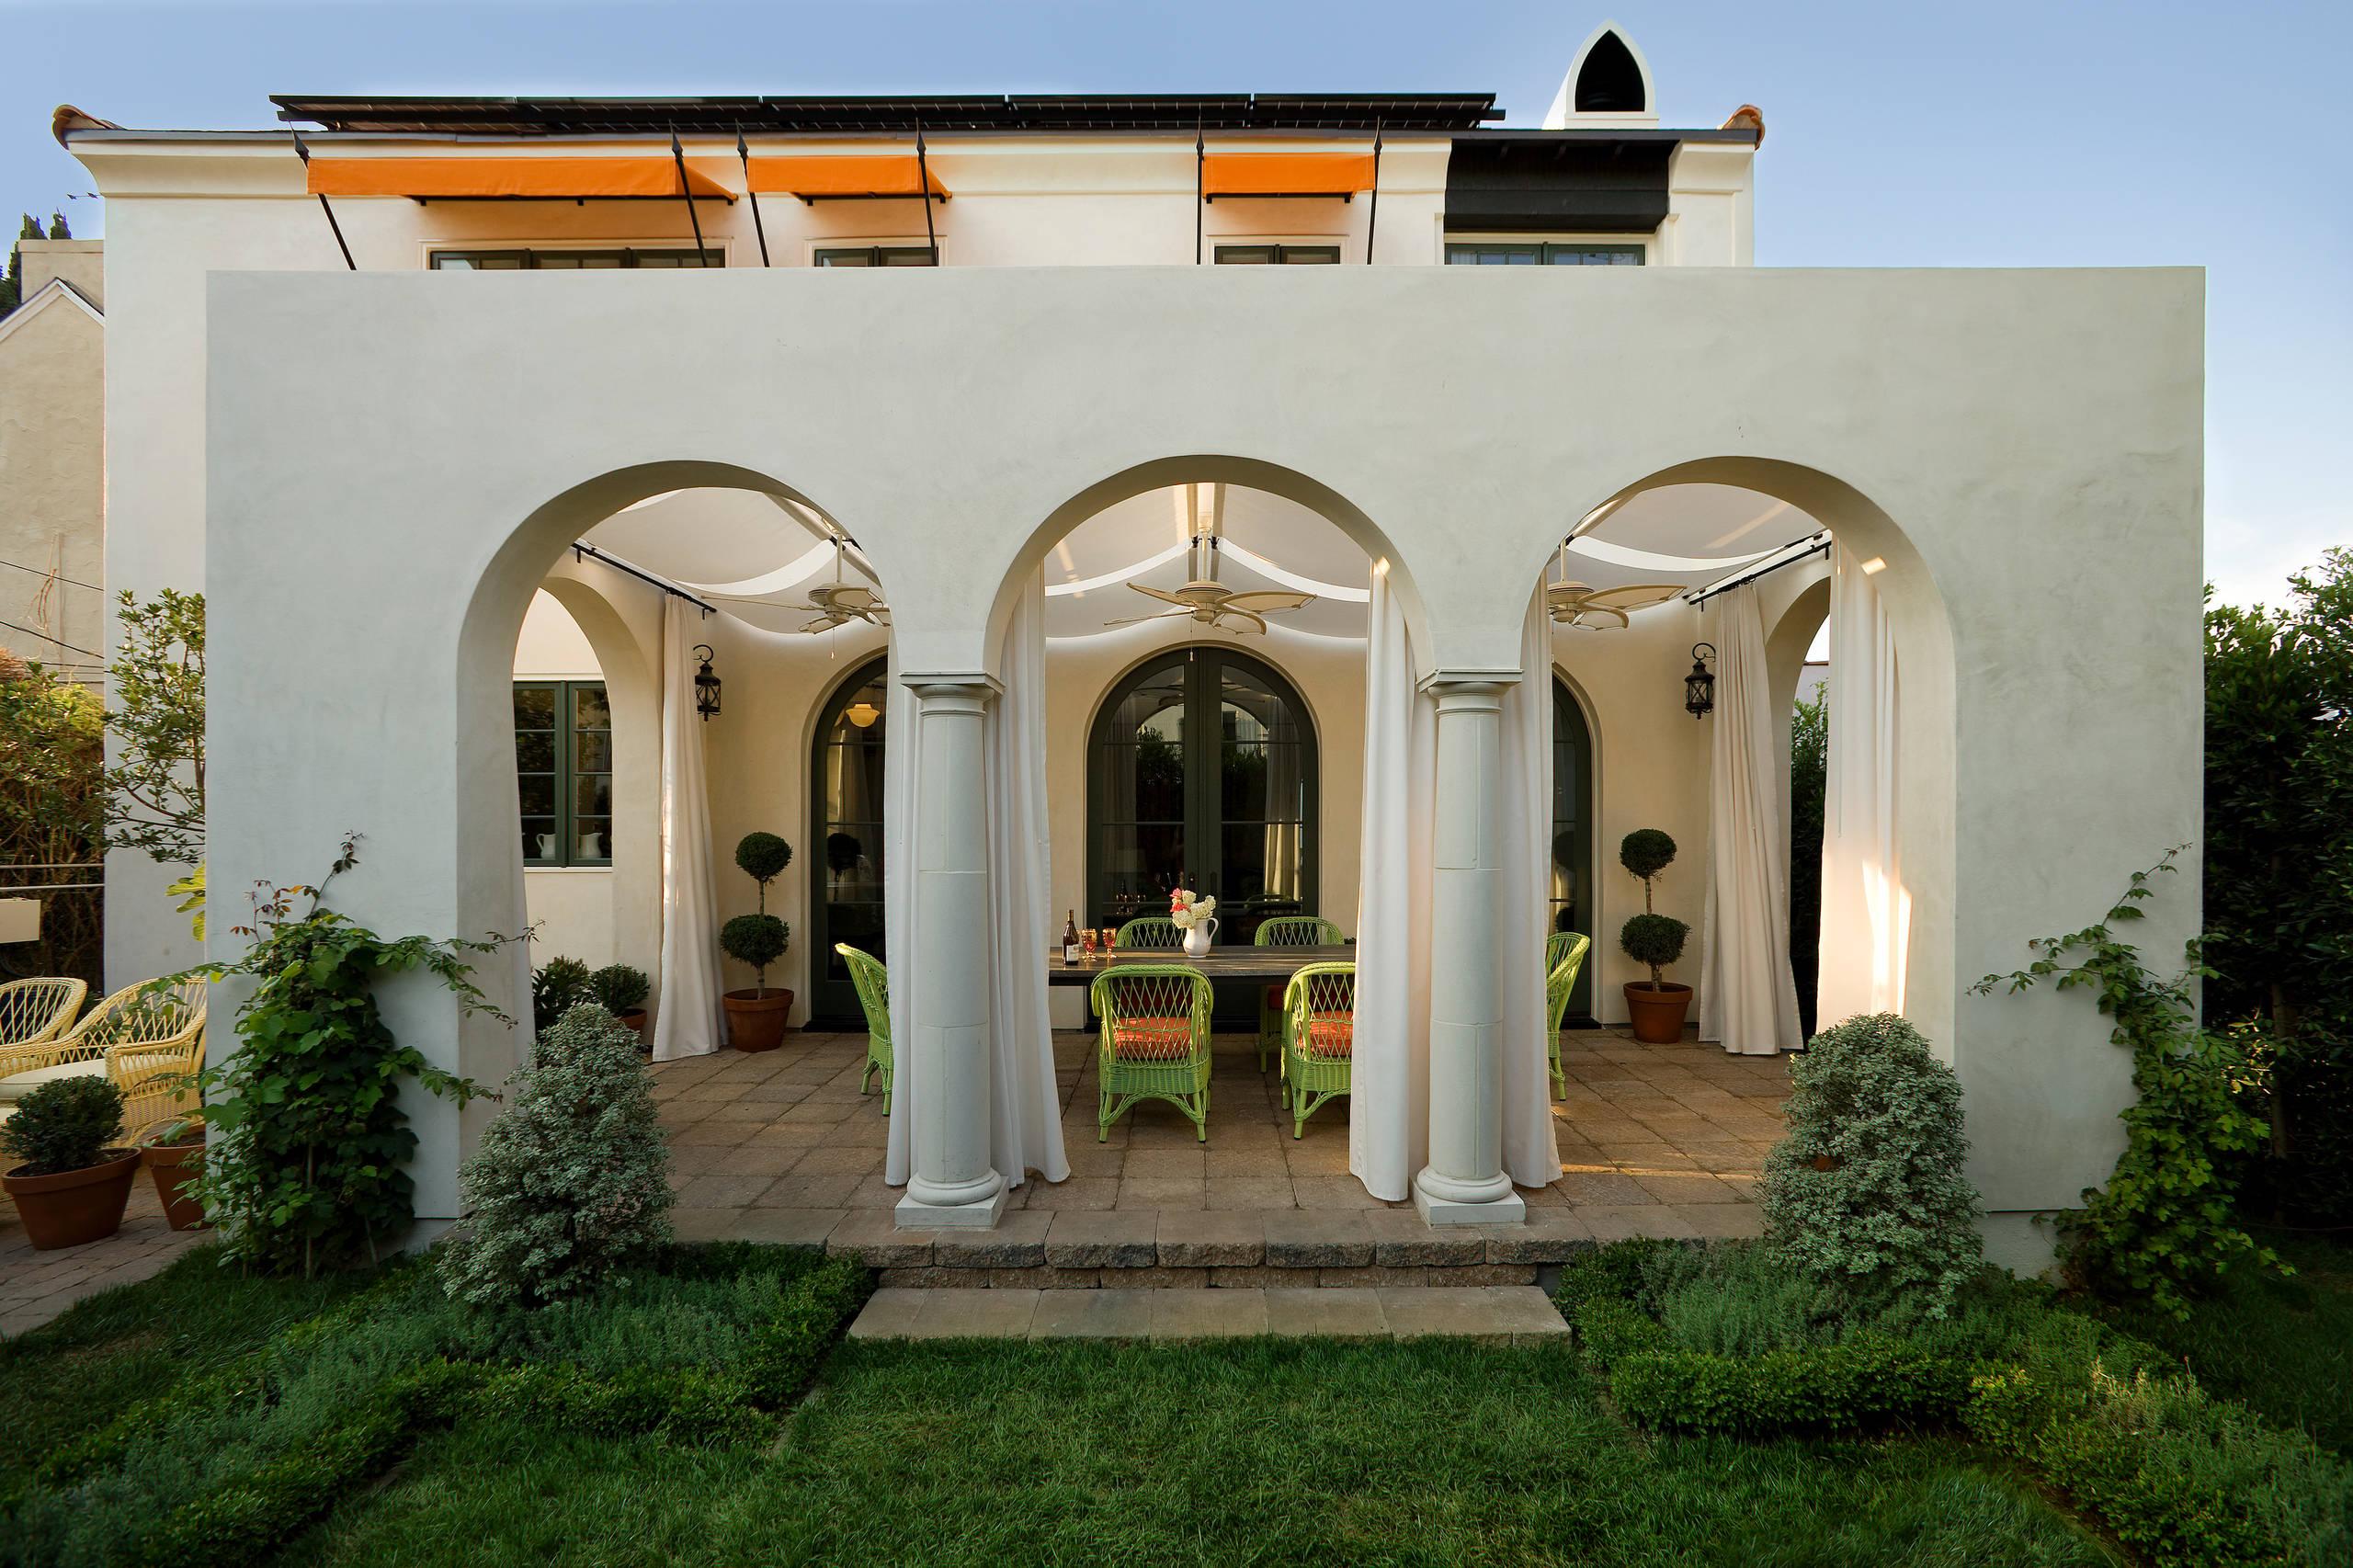 16 Beautiful Mediterranean Patio Designs That Will ... on Small Mediterranean Patio Ideas id=99282